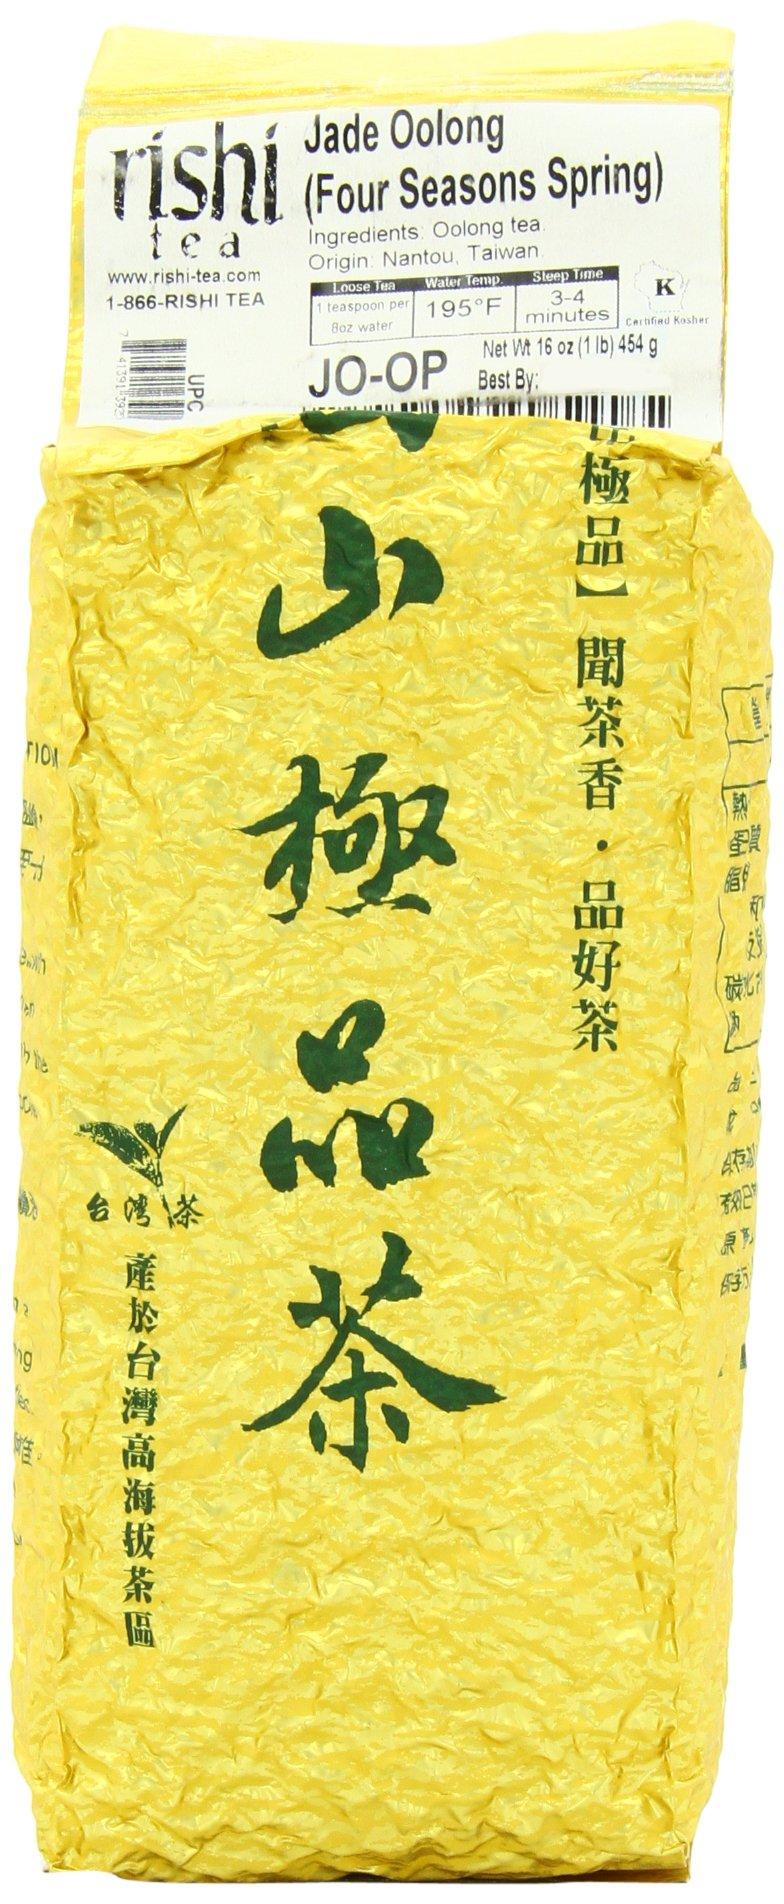 Rishi Tea, Jade Oolong (Four Season Spring), 1-Pound